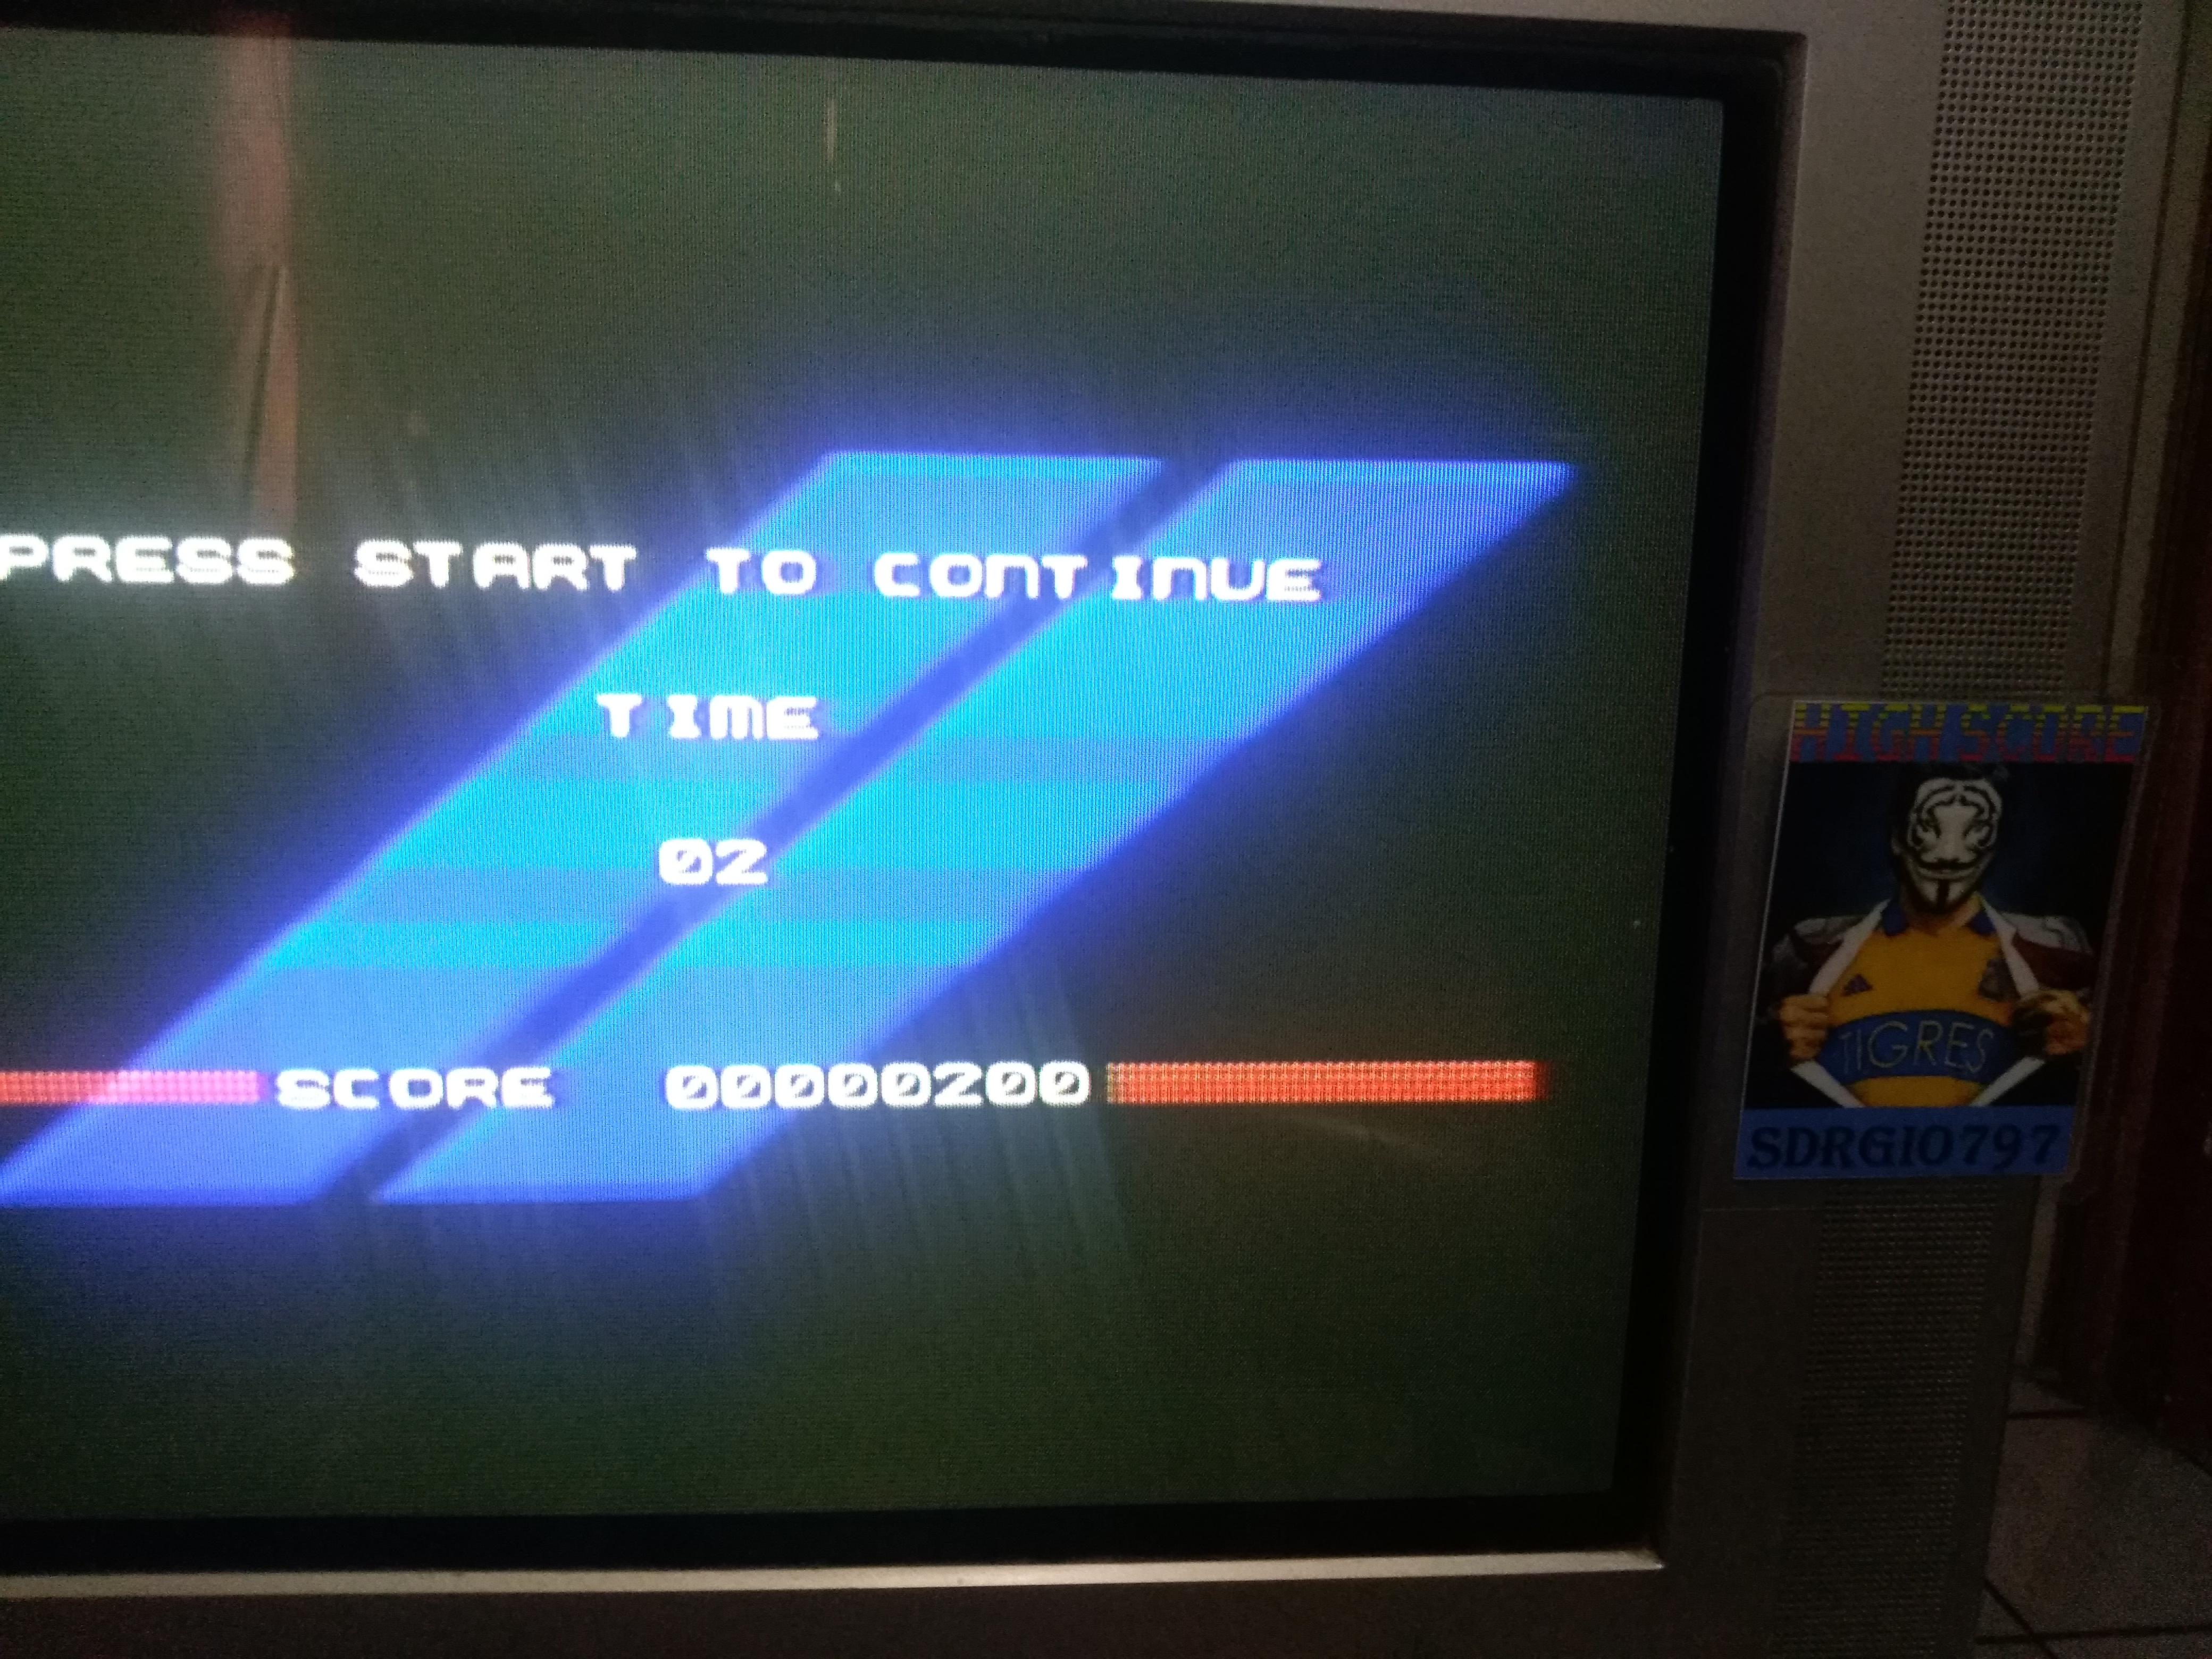 Sdrgio797: Flashback [Expert] (SNES/Super Famicom Emulated) 200 points on 2020-07-29 15:56:34